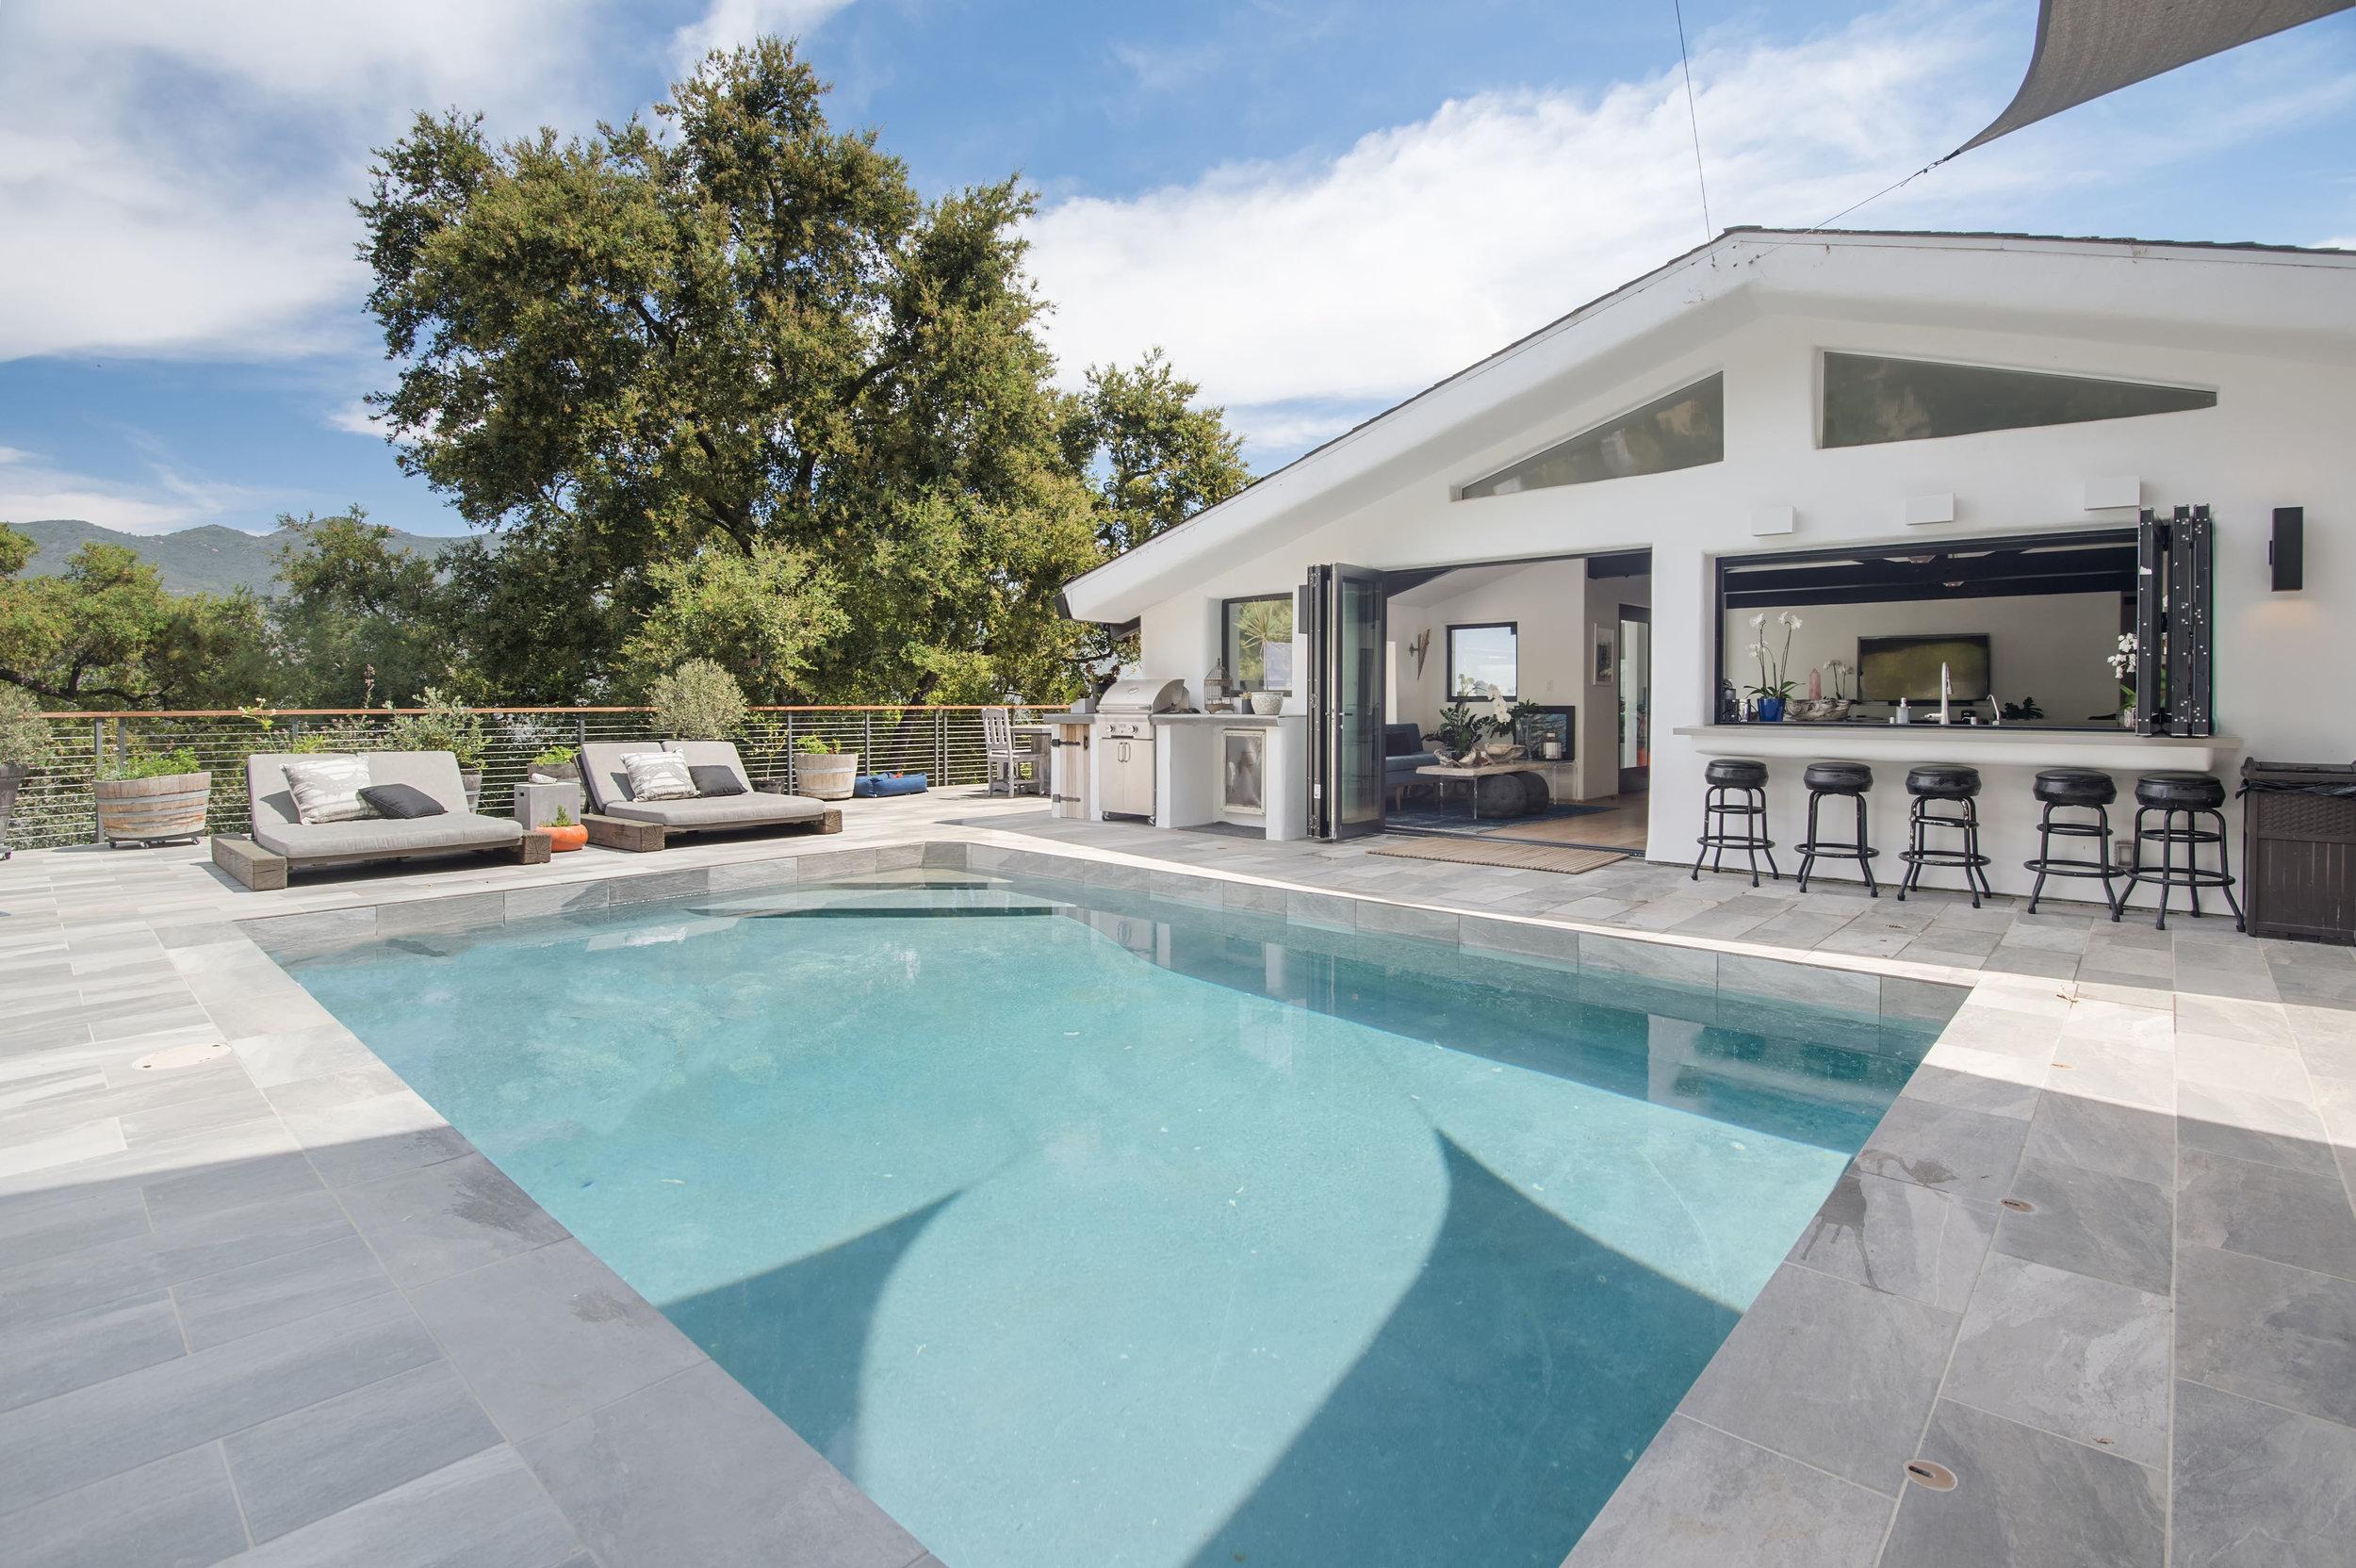 001 Pool 26272 Cool Glen Way Malibu For Sale Luxury Real Estate.jpg